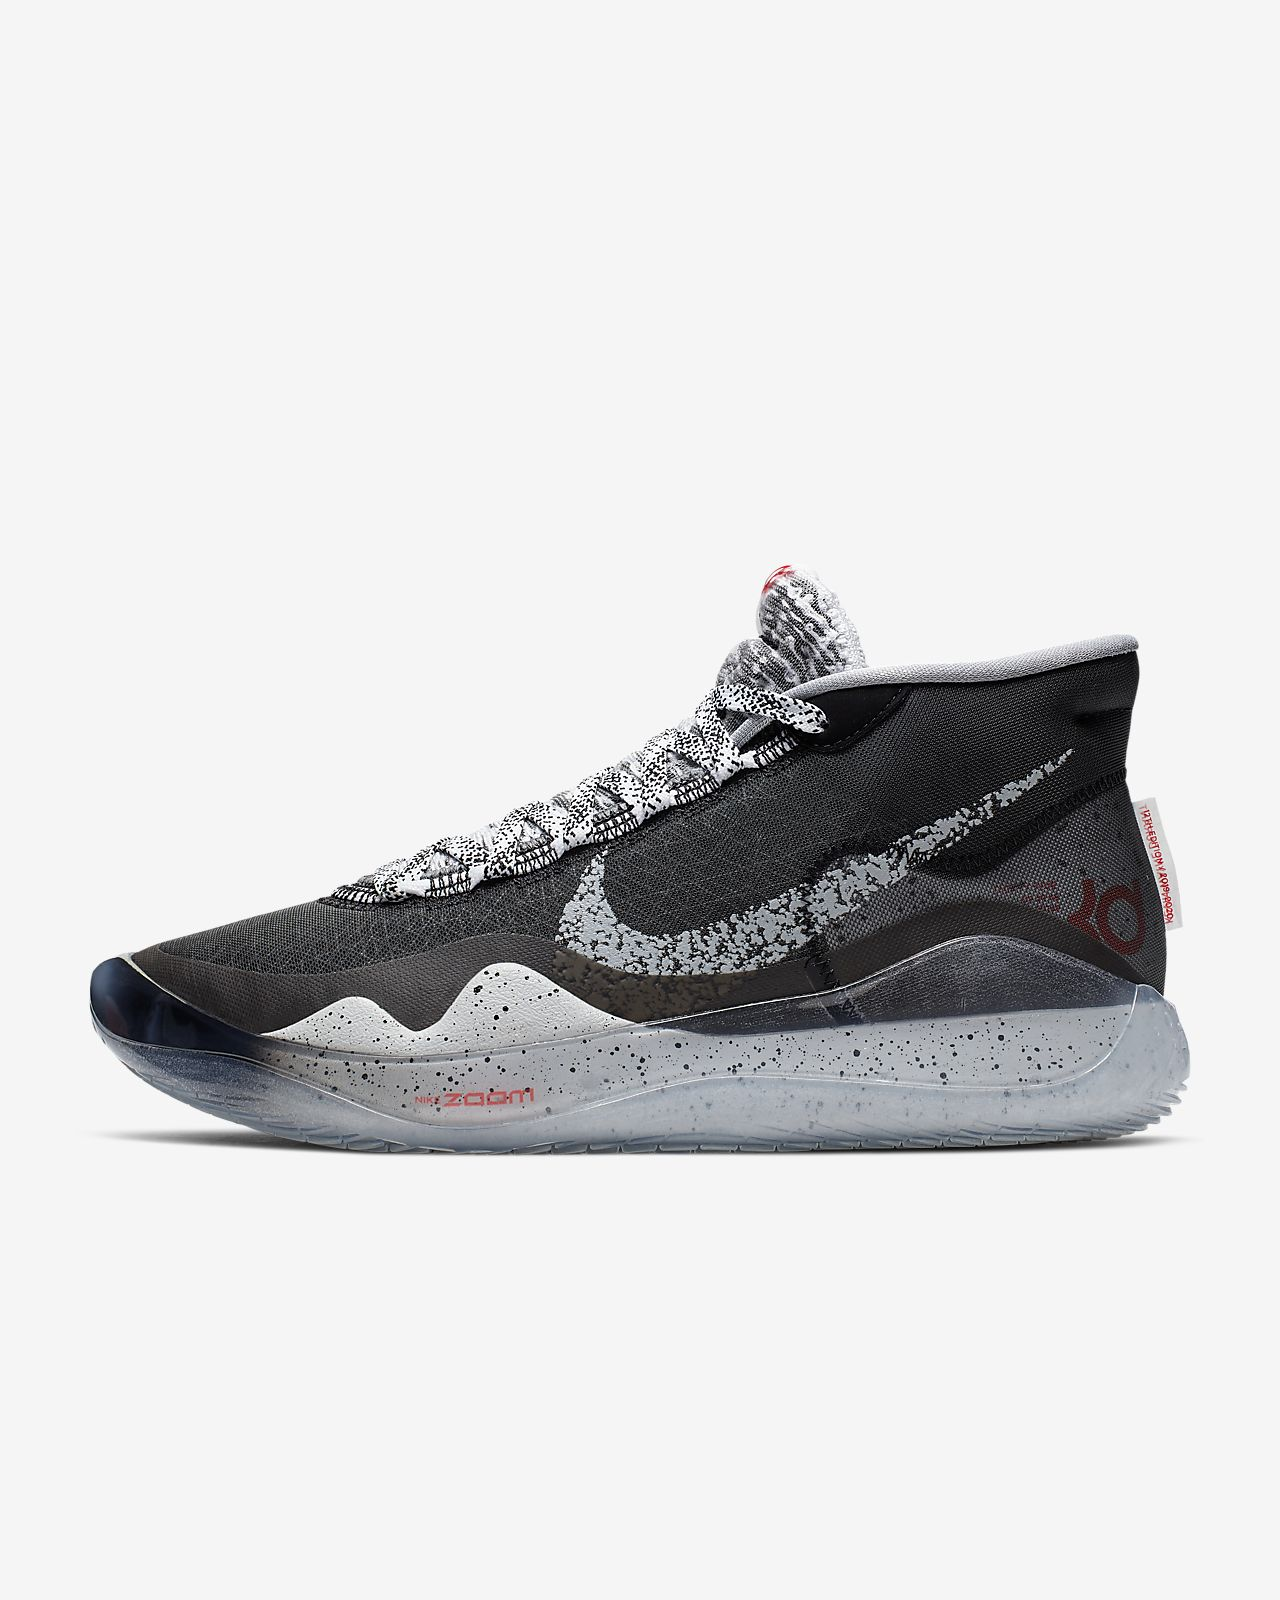 Nike Zoom KD12 EP男子篮球鞋